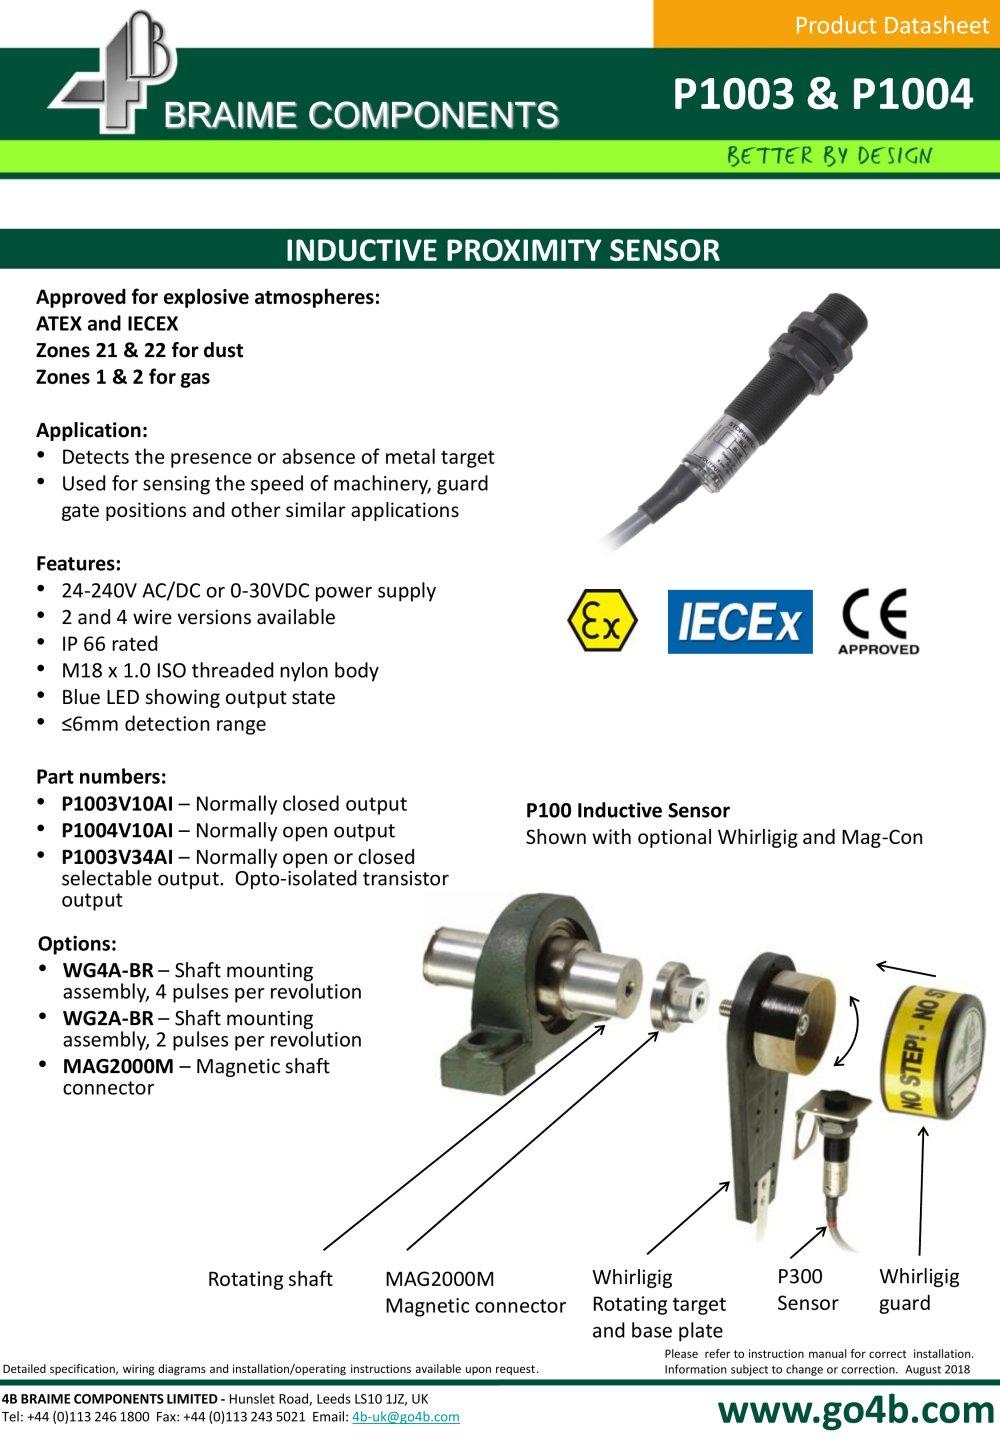 medium resolution of p1003 and p1004 18mm inductive proximity sensor 4b braime cat 3 wiring diagram ac inductive proximity